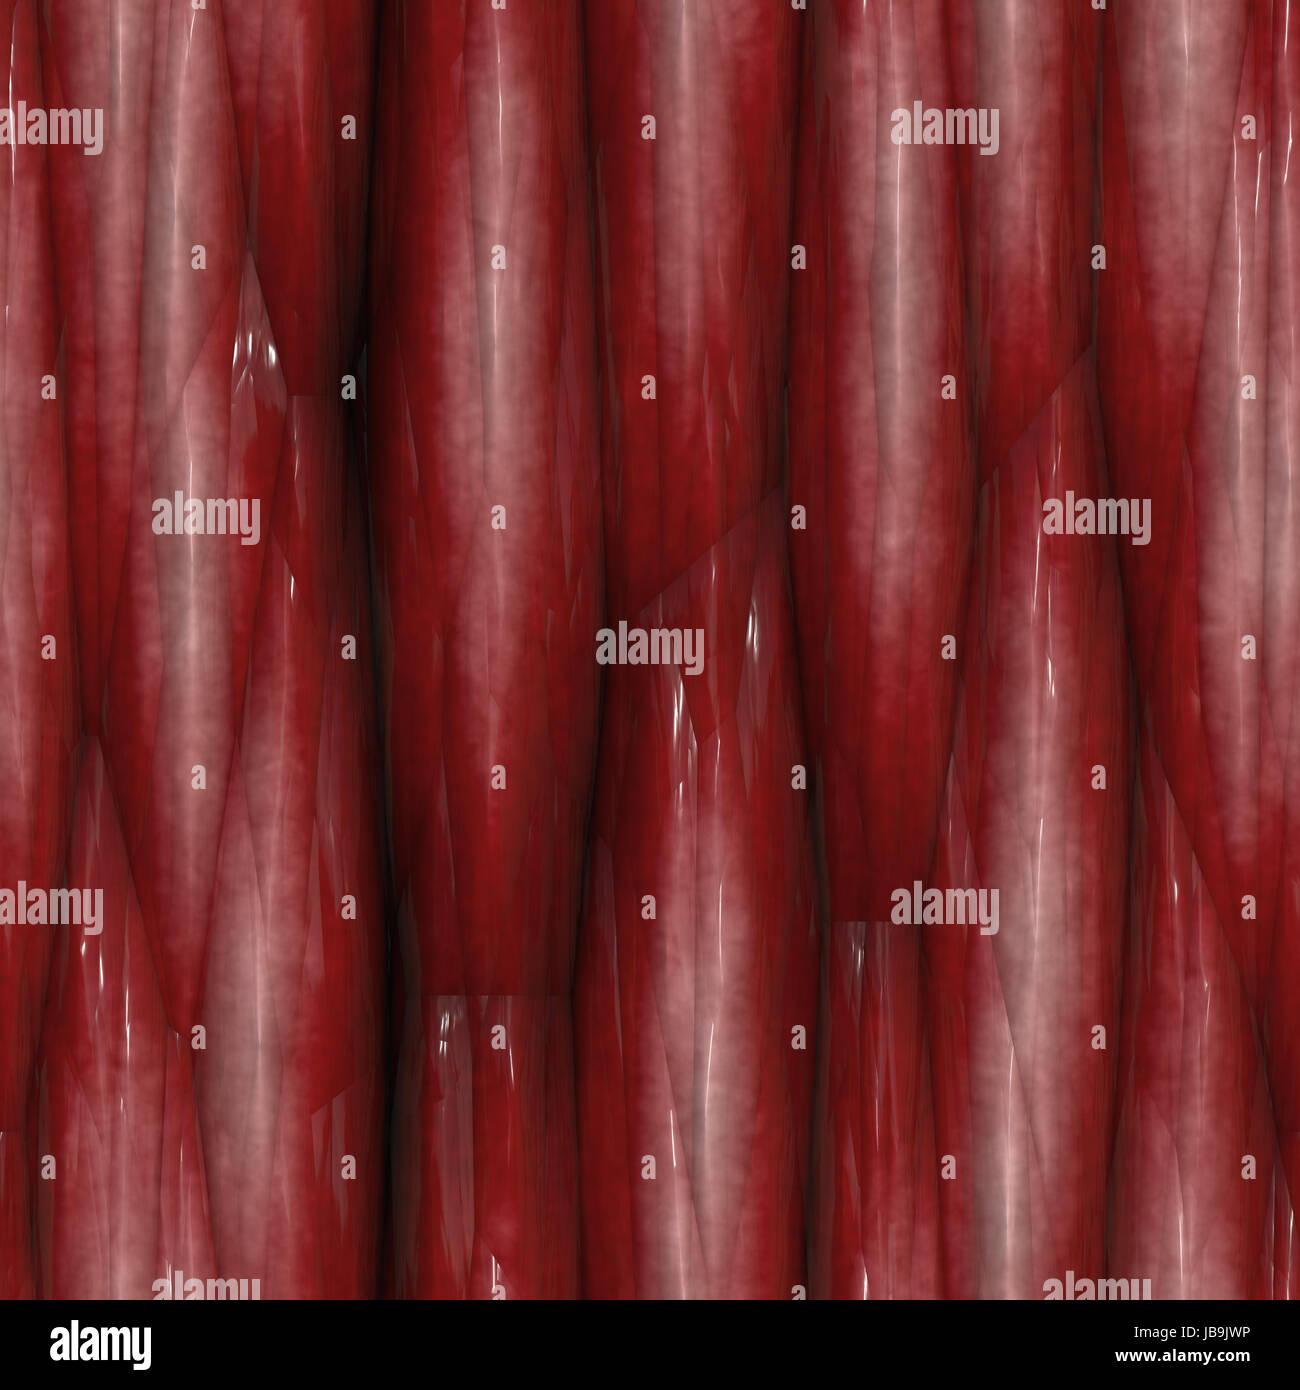 illustration fibres - Stock Image